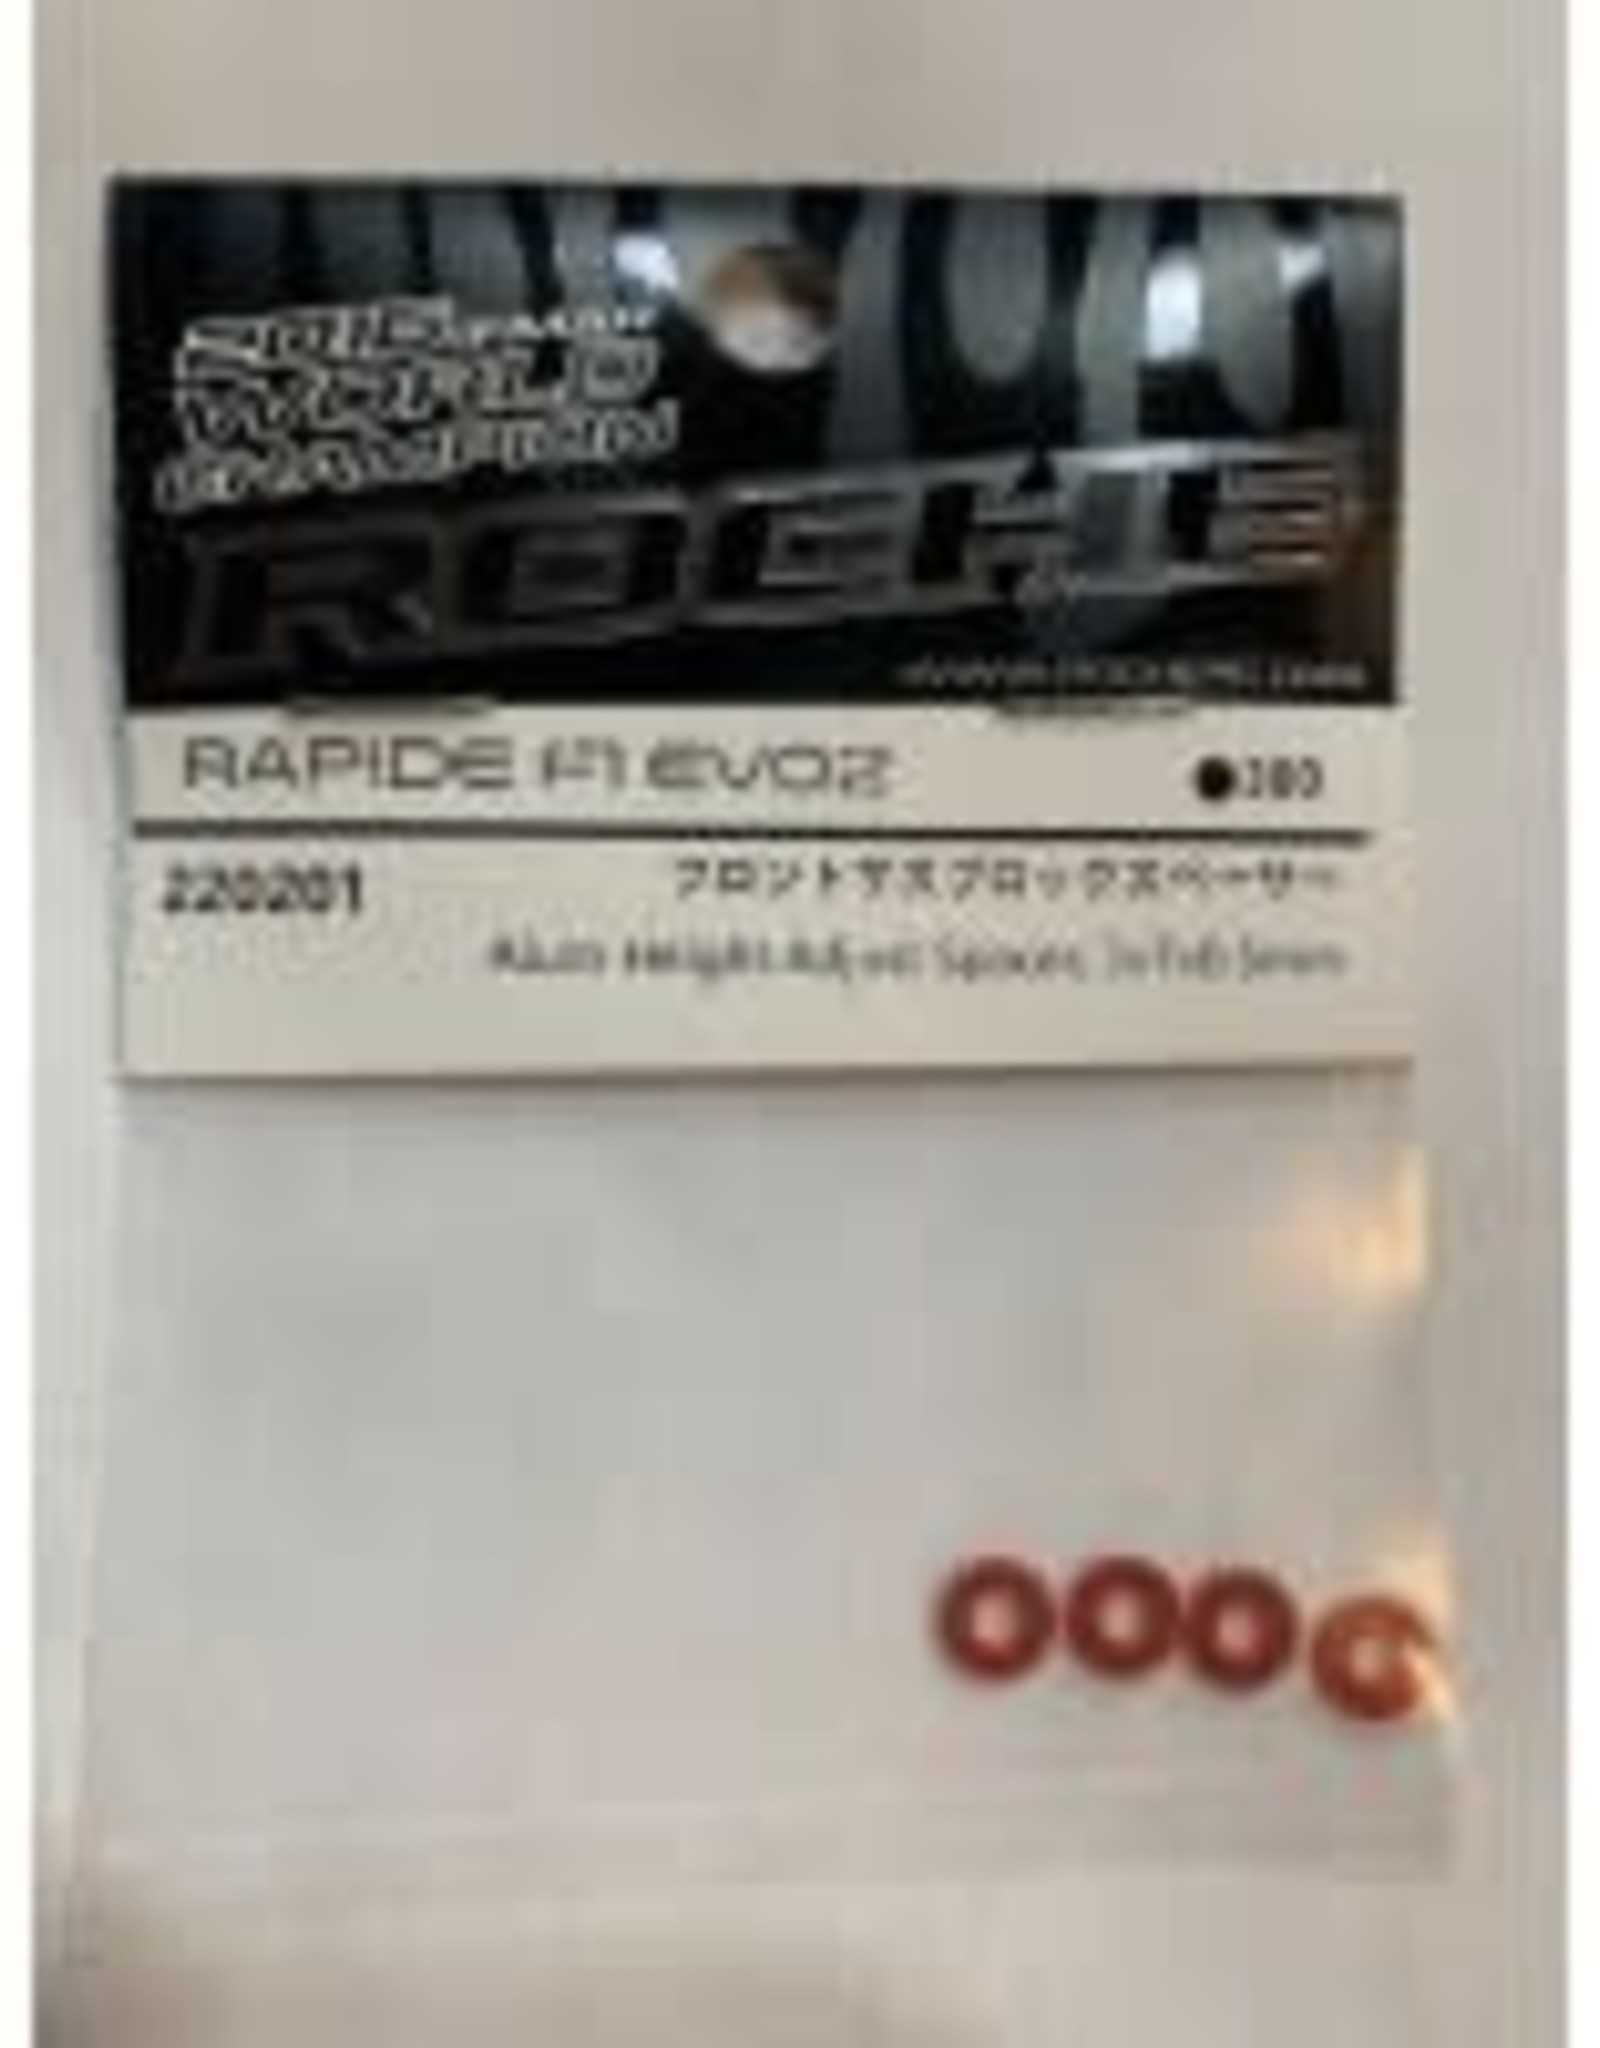 Roche Aluminium Height Adjust Spacer, 0.5mm